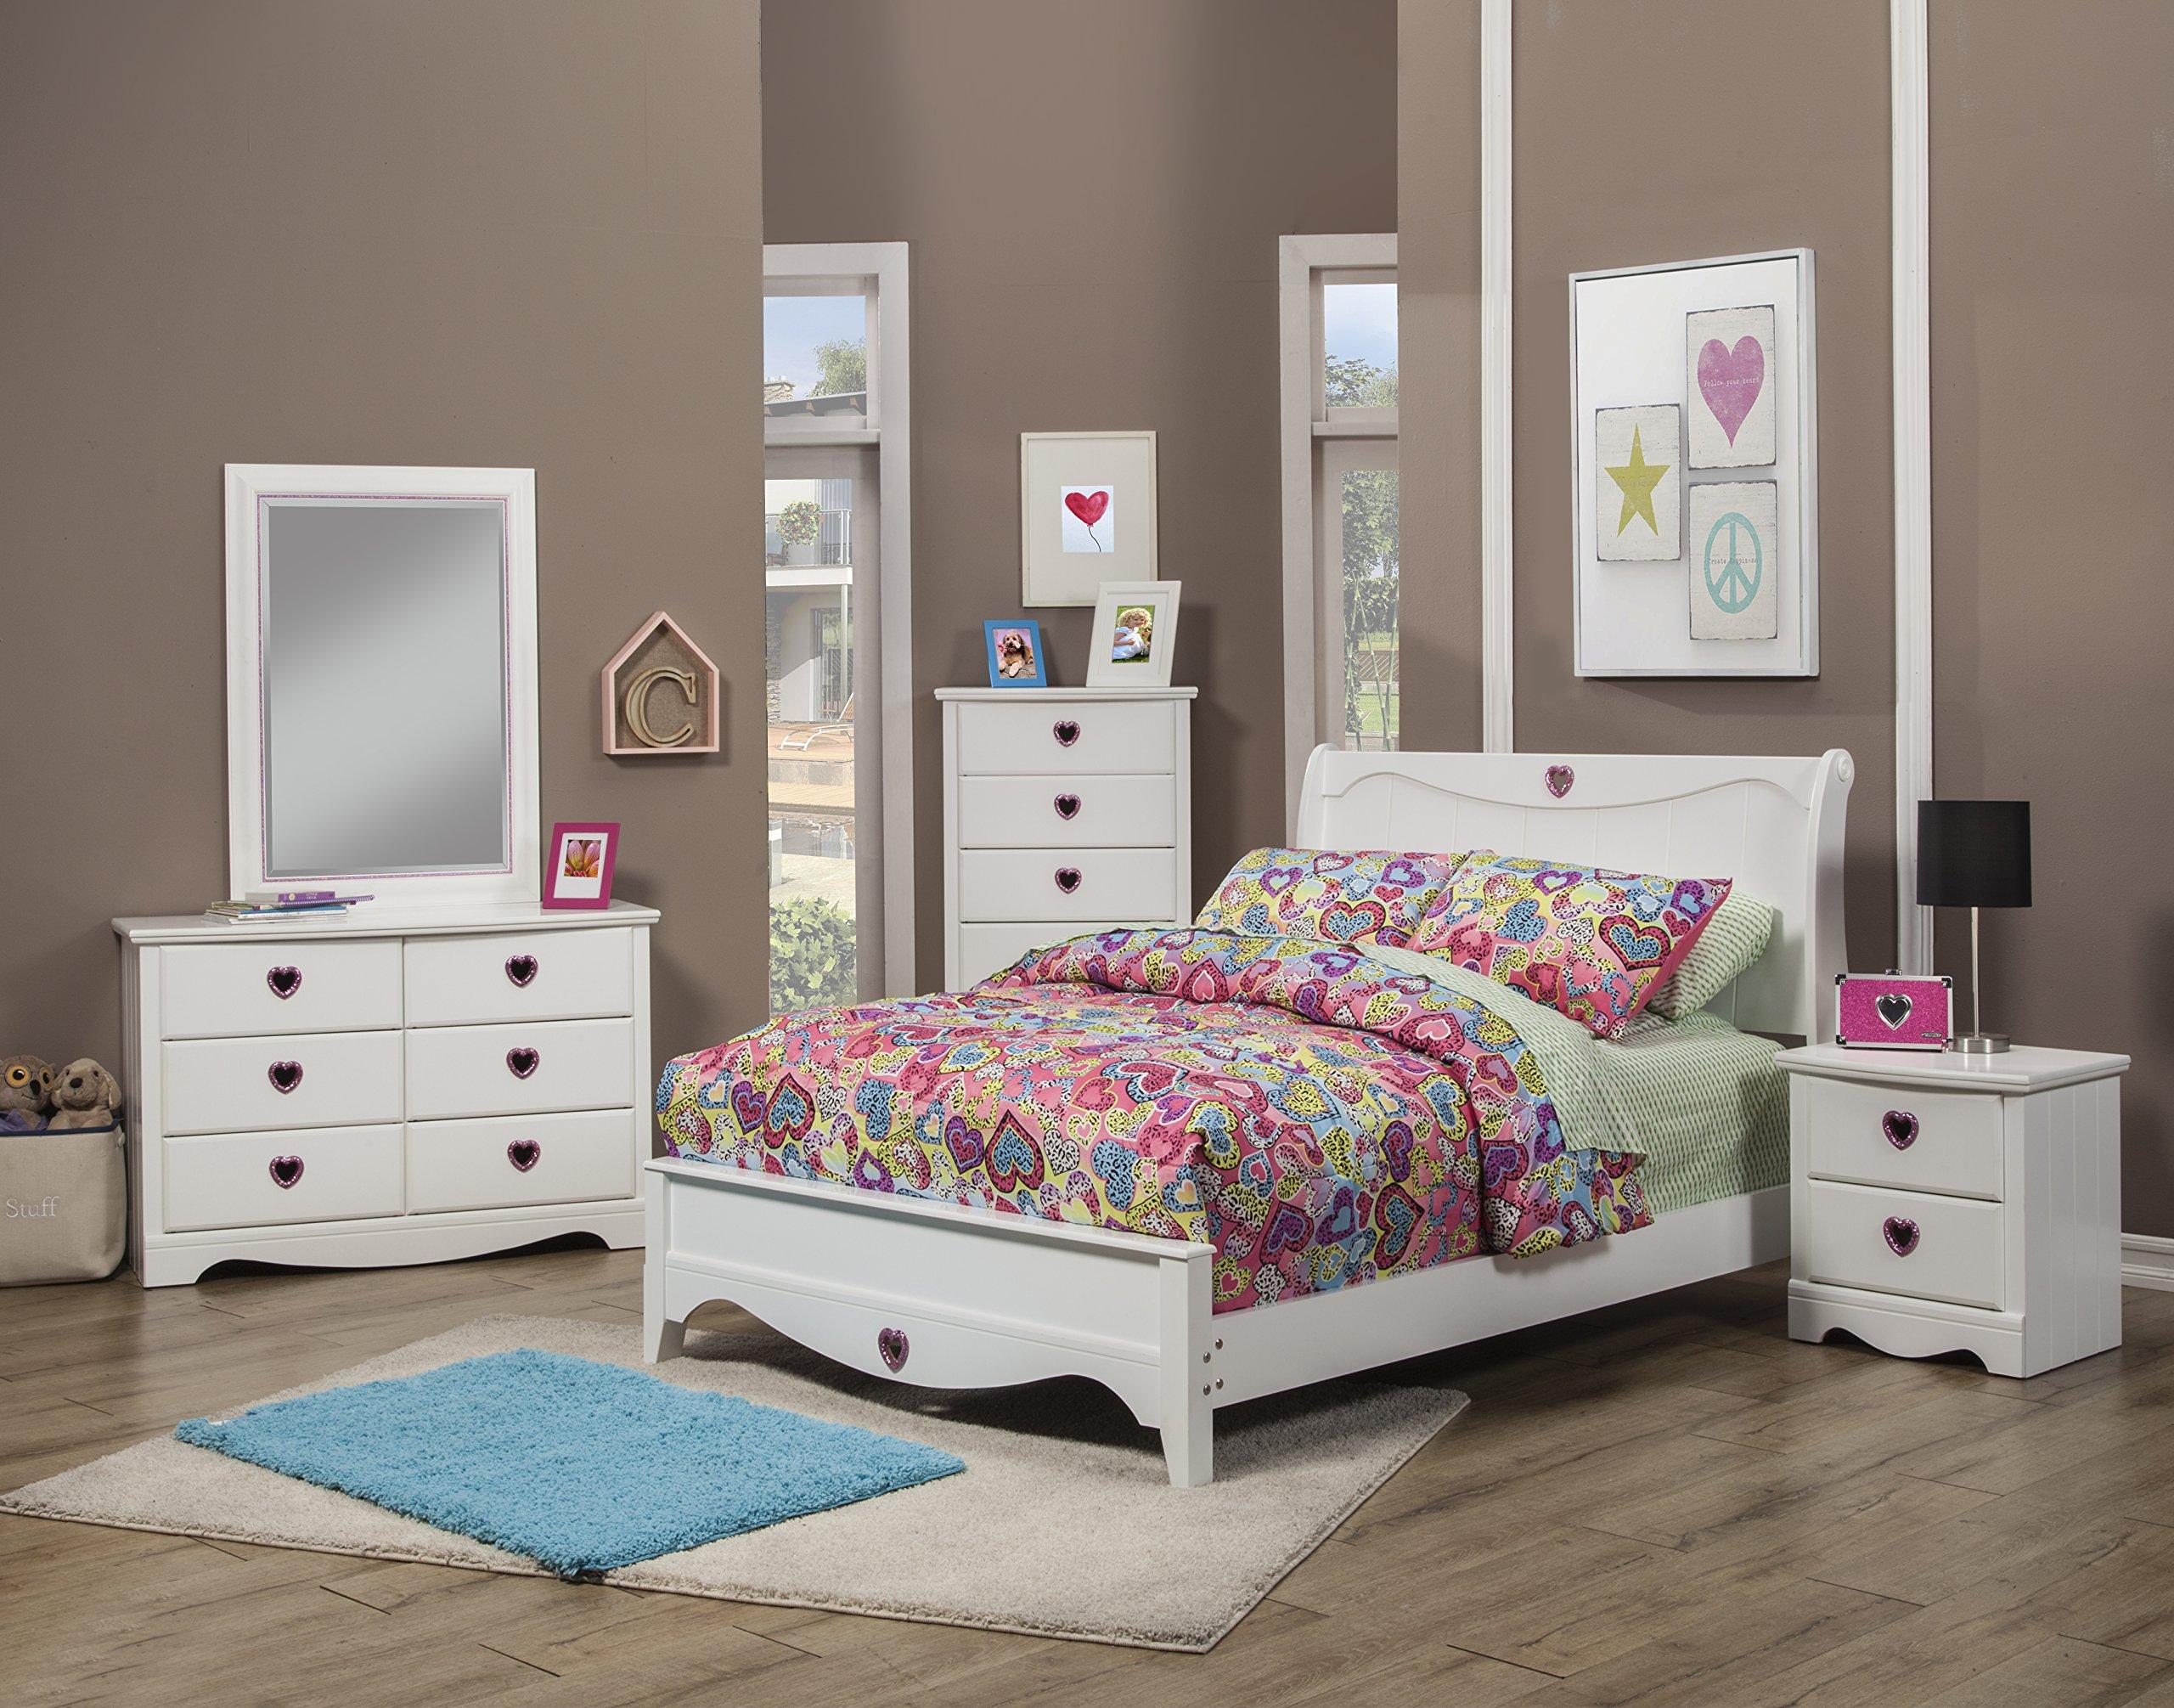 Sandberg Furniture Sparkling Hearts Bedroom Set, Full, Frost White